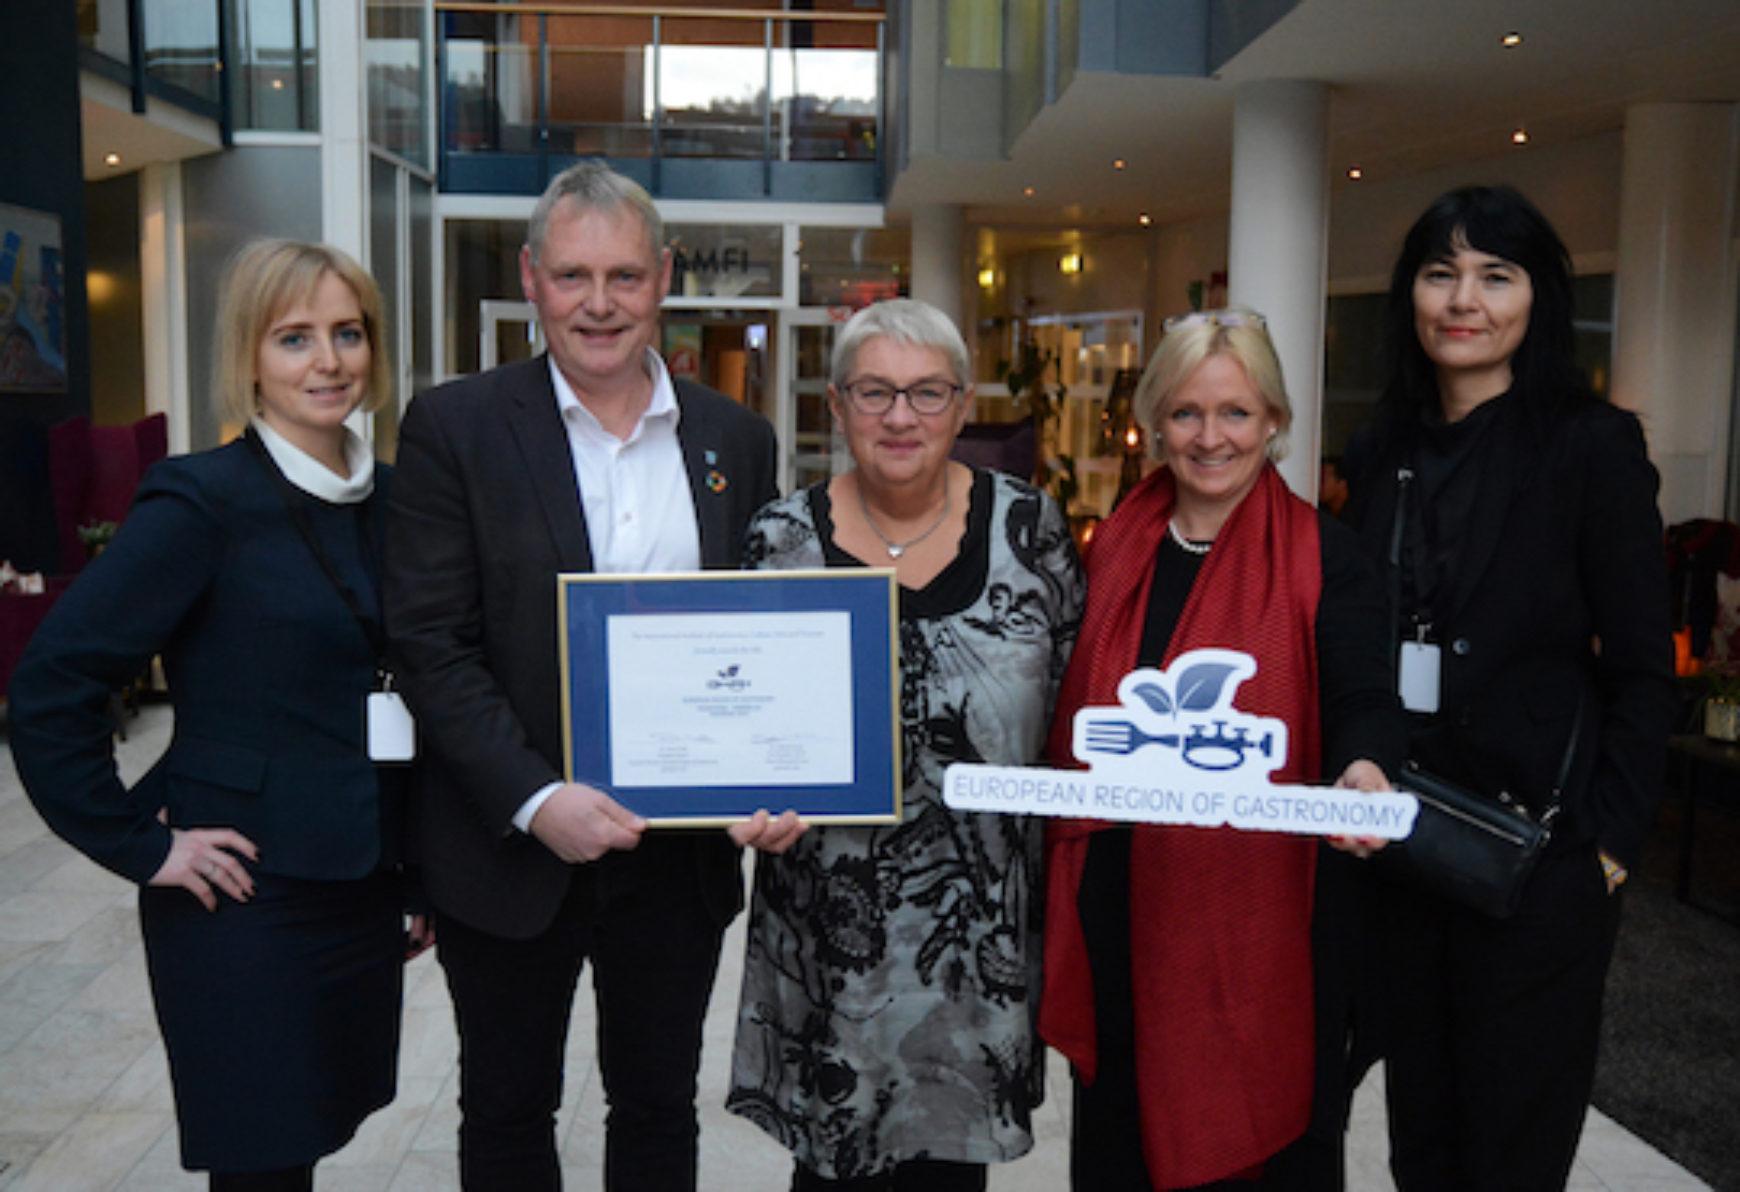 Trondheim-Trøndelag awarded European Region of Gastronomy 2022